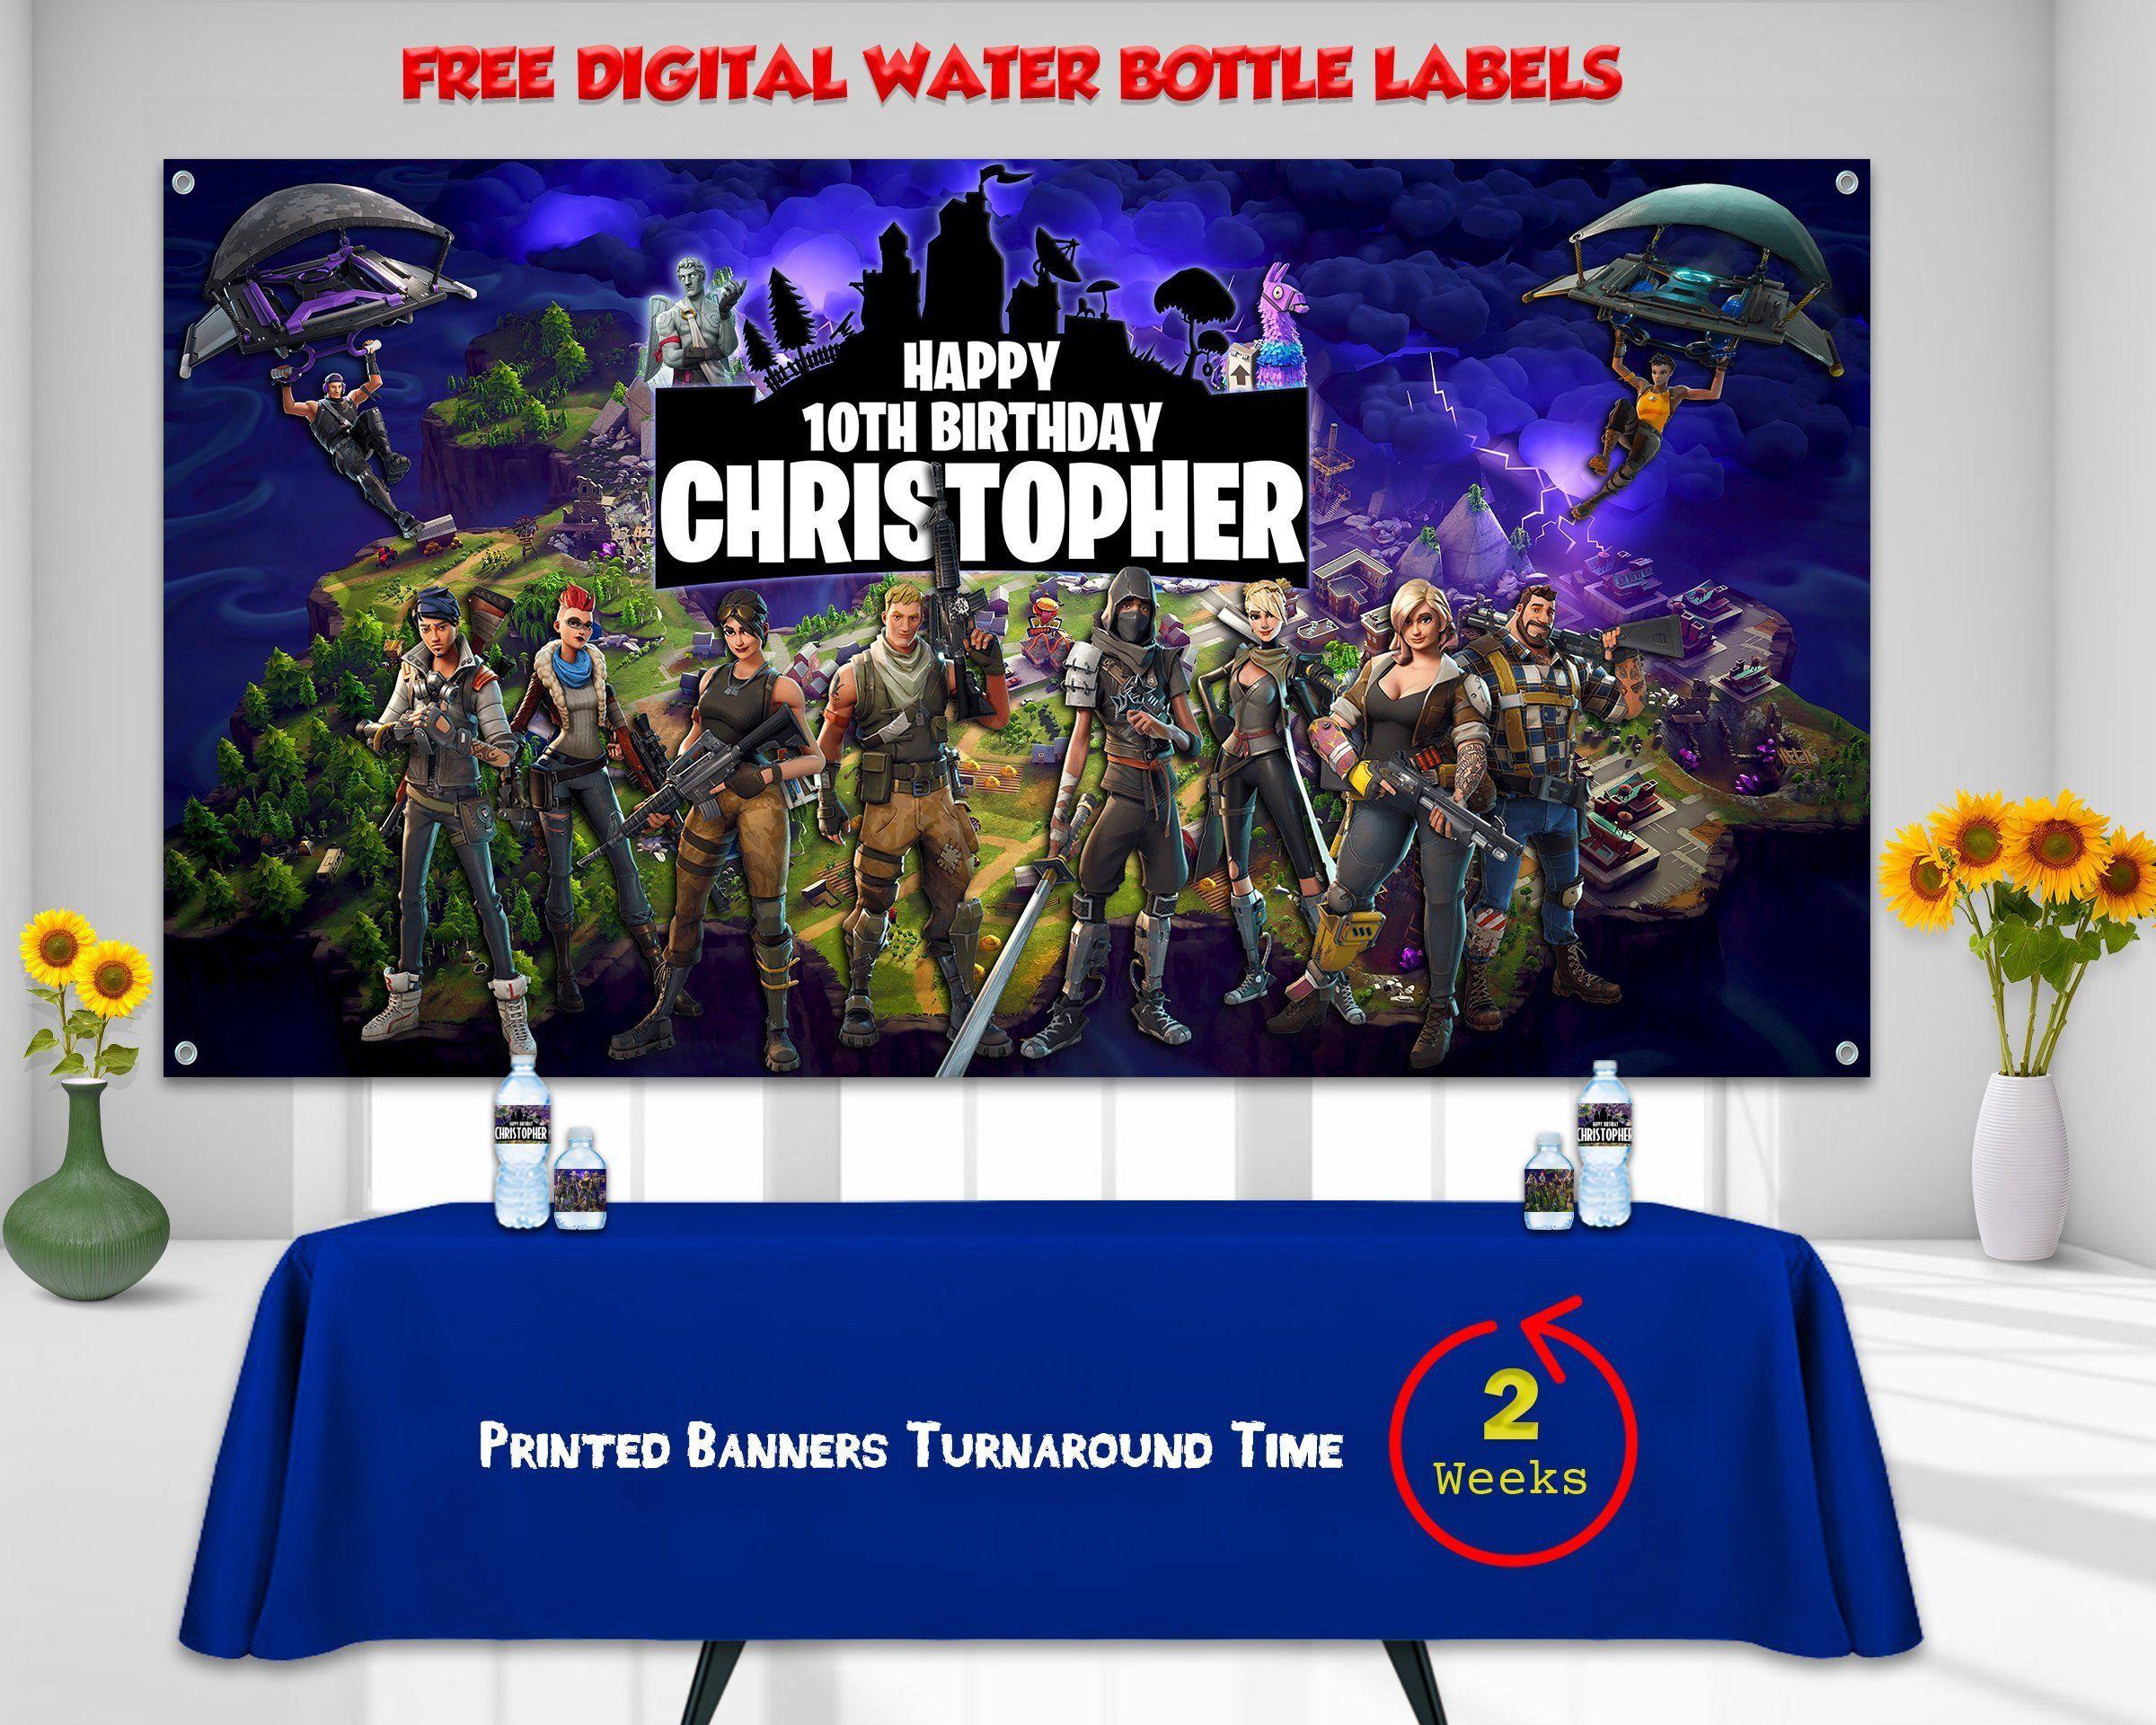 Fortnite Banner Fortnite Backdrop Fortnite Vinyl Canvas Vinyl Canvas Fortnite Water Bottle Labels F Banner Printing Birthday Backdrop Personalized Banners